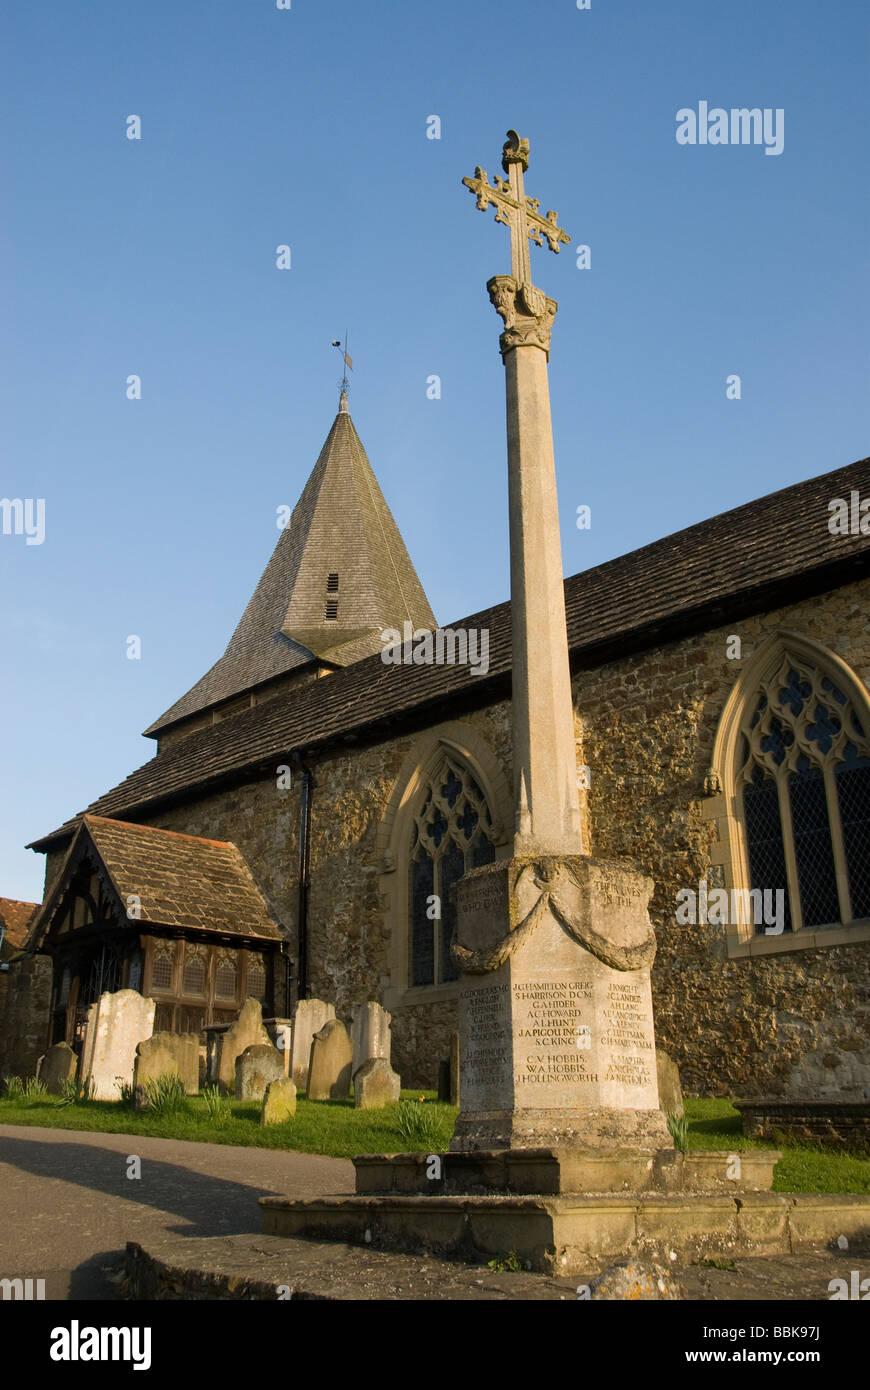 St Marys Church, Westerham, Kent, England - Stock Image